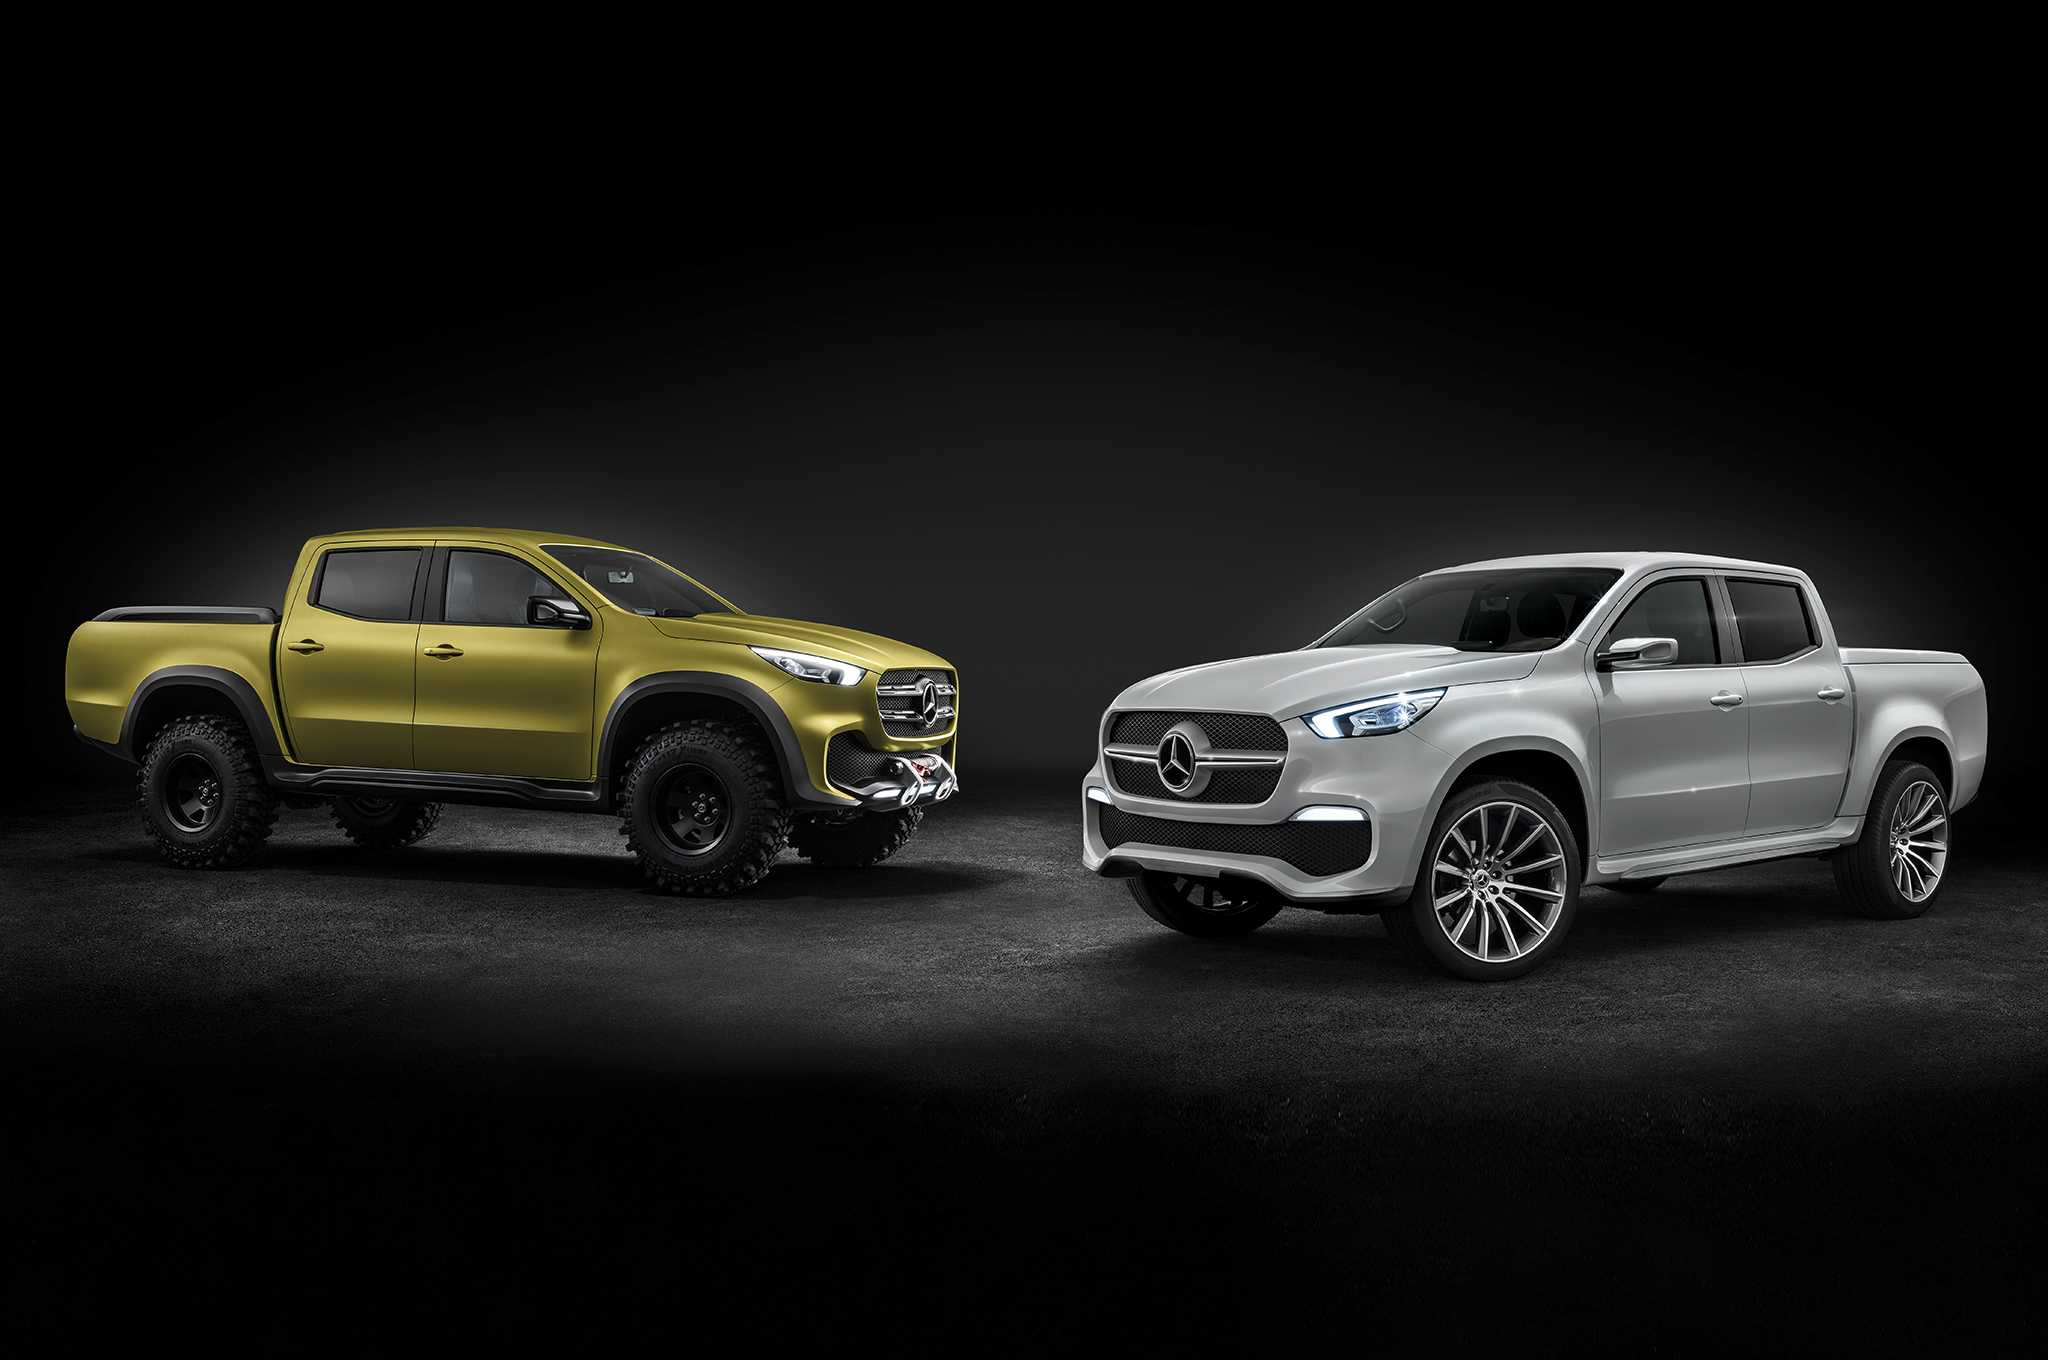 Mercedes Benz X-Class Pickup Truck Models Unveiled at Sweden